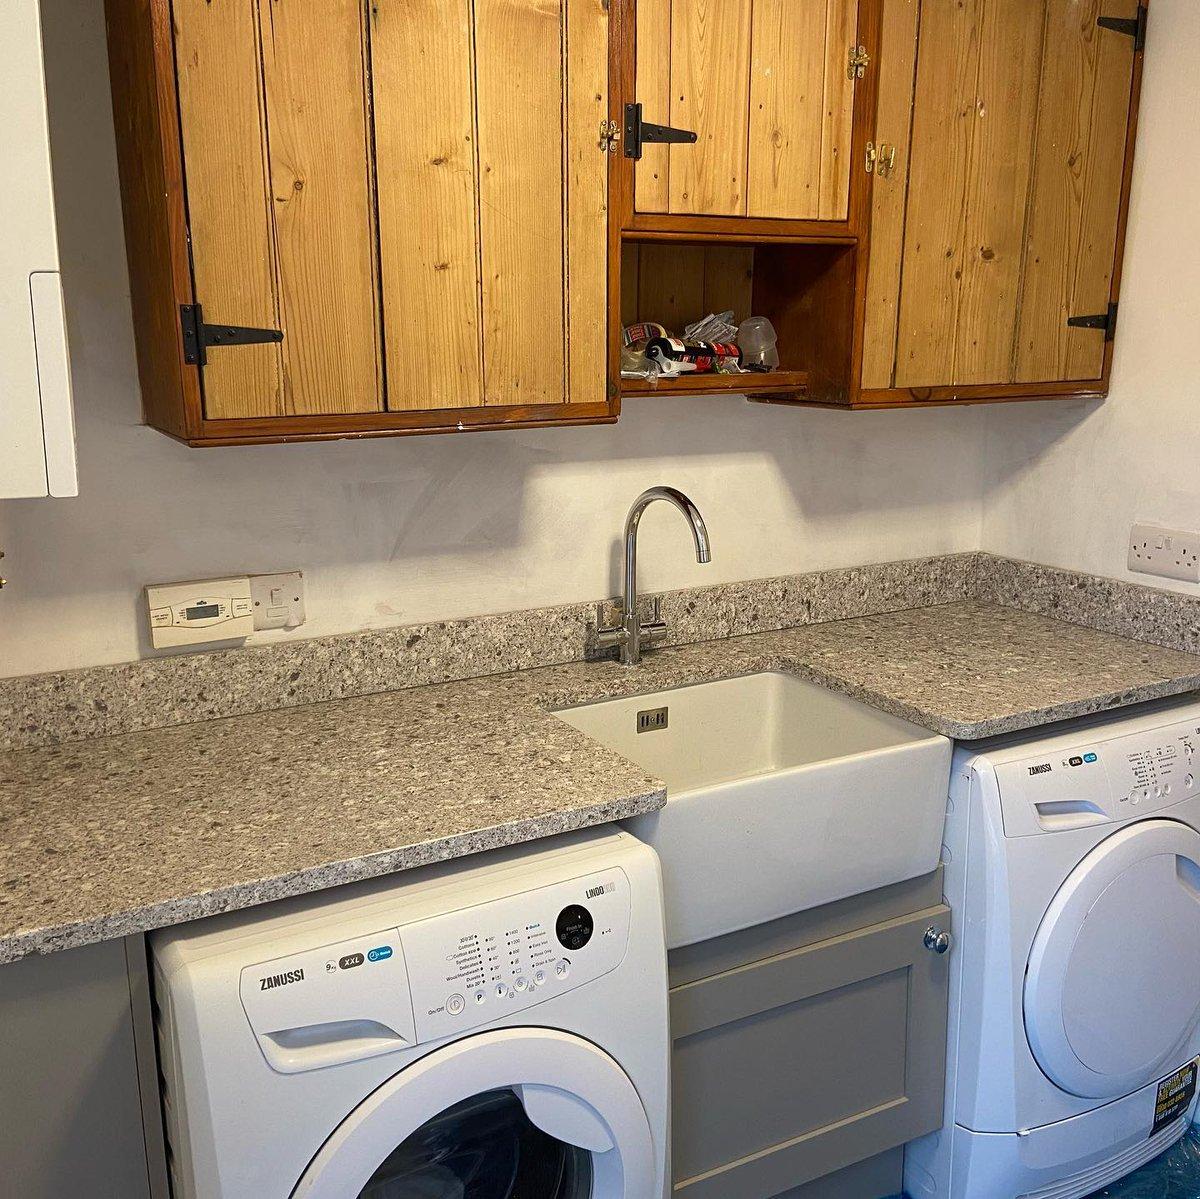 This utility room was given a new lease of life with the beautiful Atlantic Salt quartz from @CaesarstoneUK. marble-granite-quartz.com #caerstonecountertops #utilityroom #yorkshirequartz